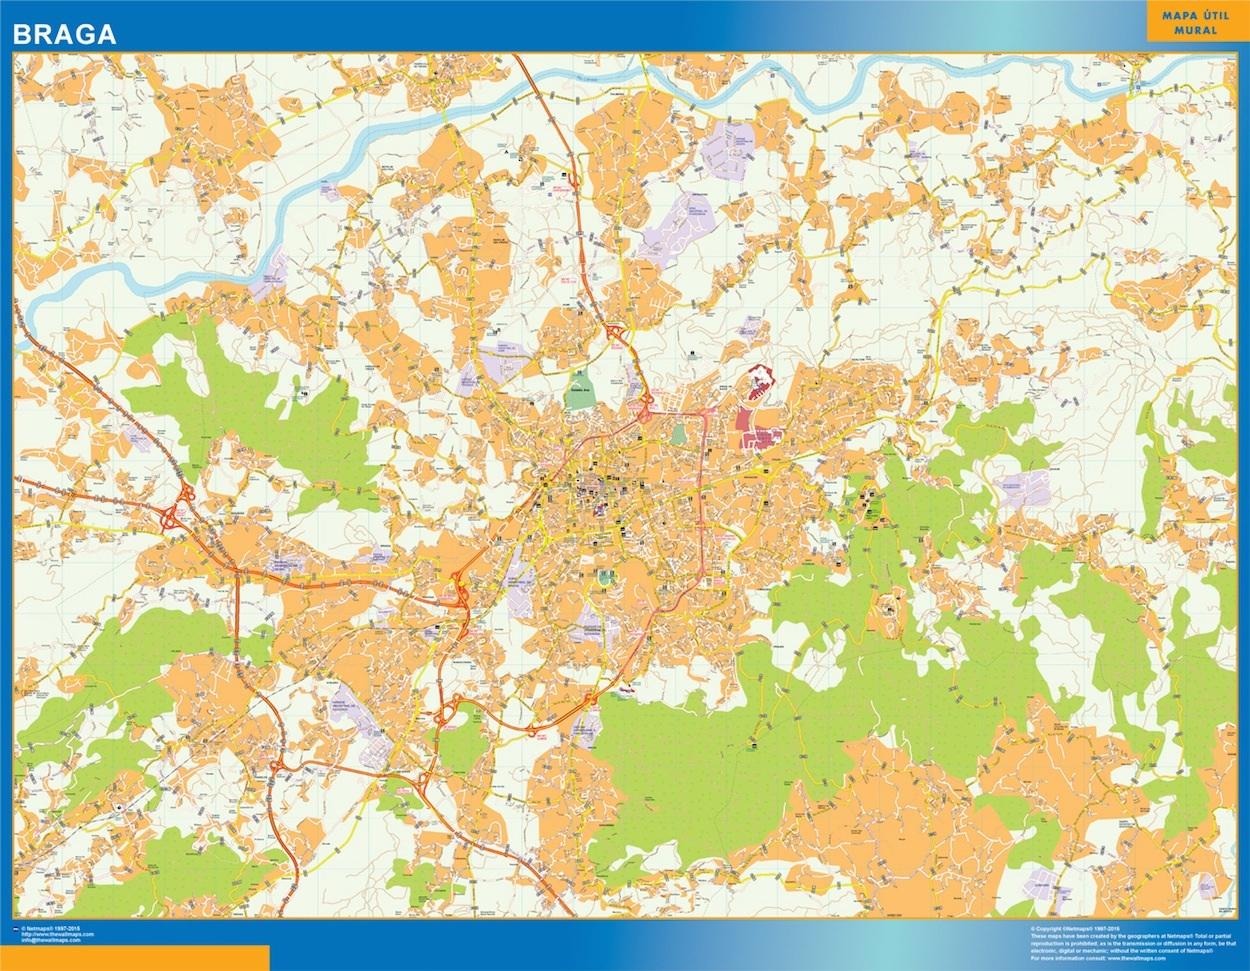 Mapa Braga en plastificado gigante